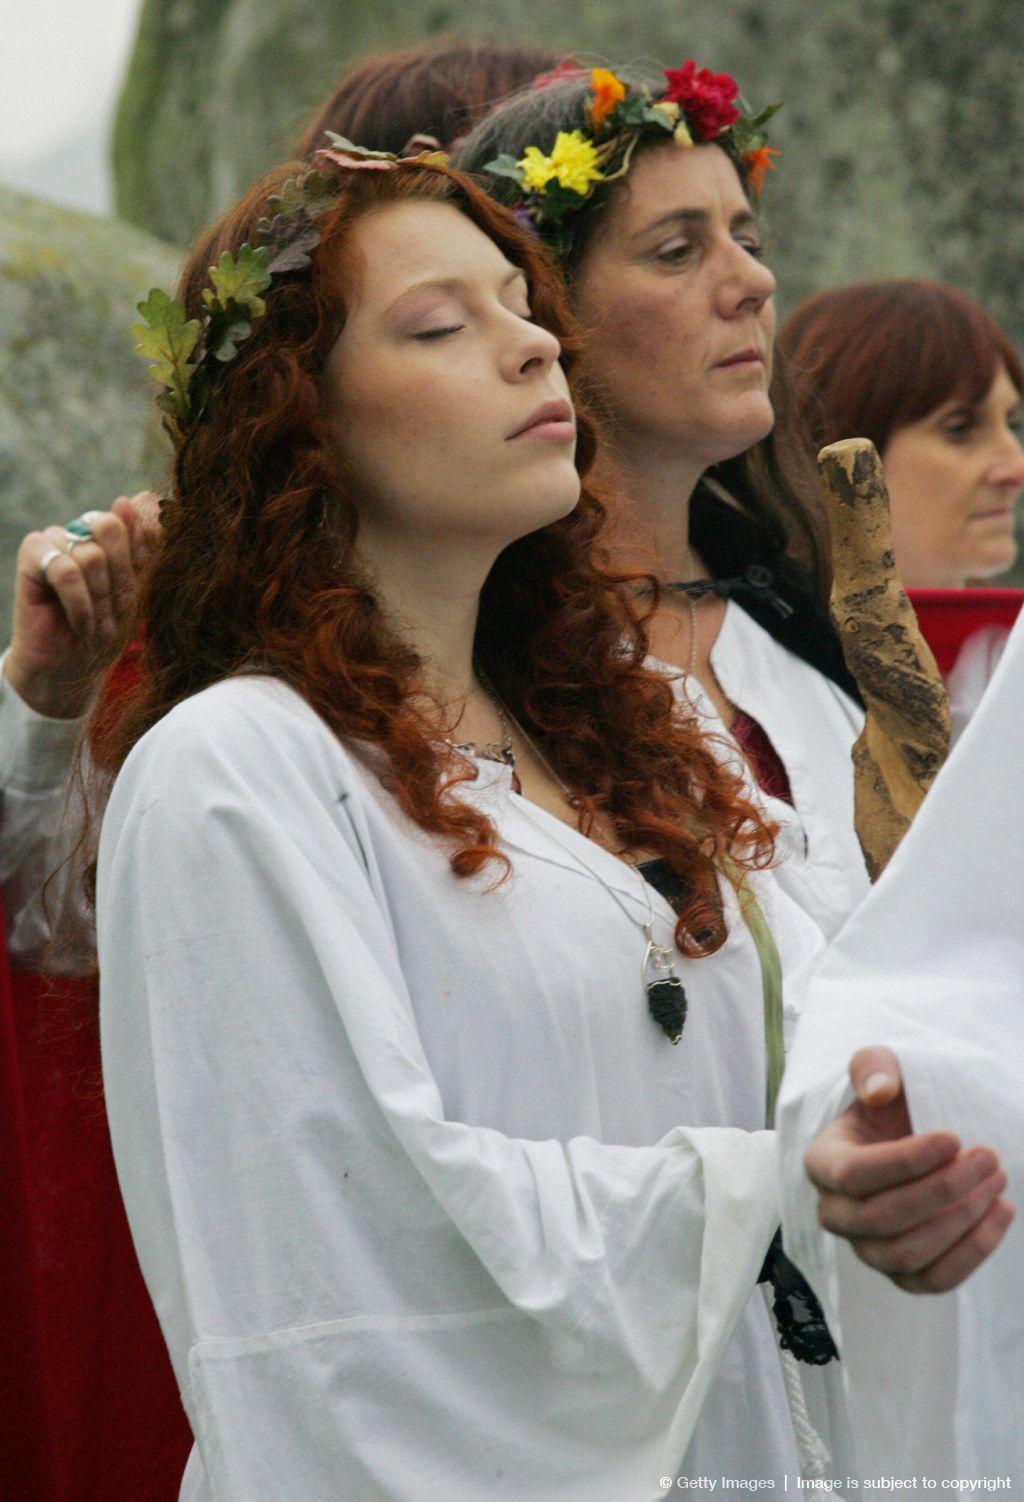 Druids Perform A Pagan Samhain Blessing Ceremony Stonehenge Pagan Festivals Celtic Paganism Druid